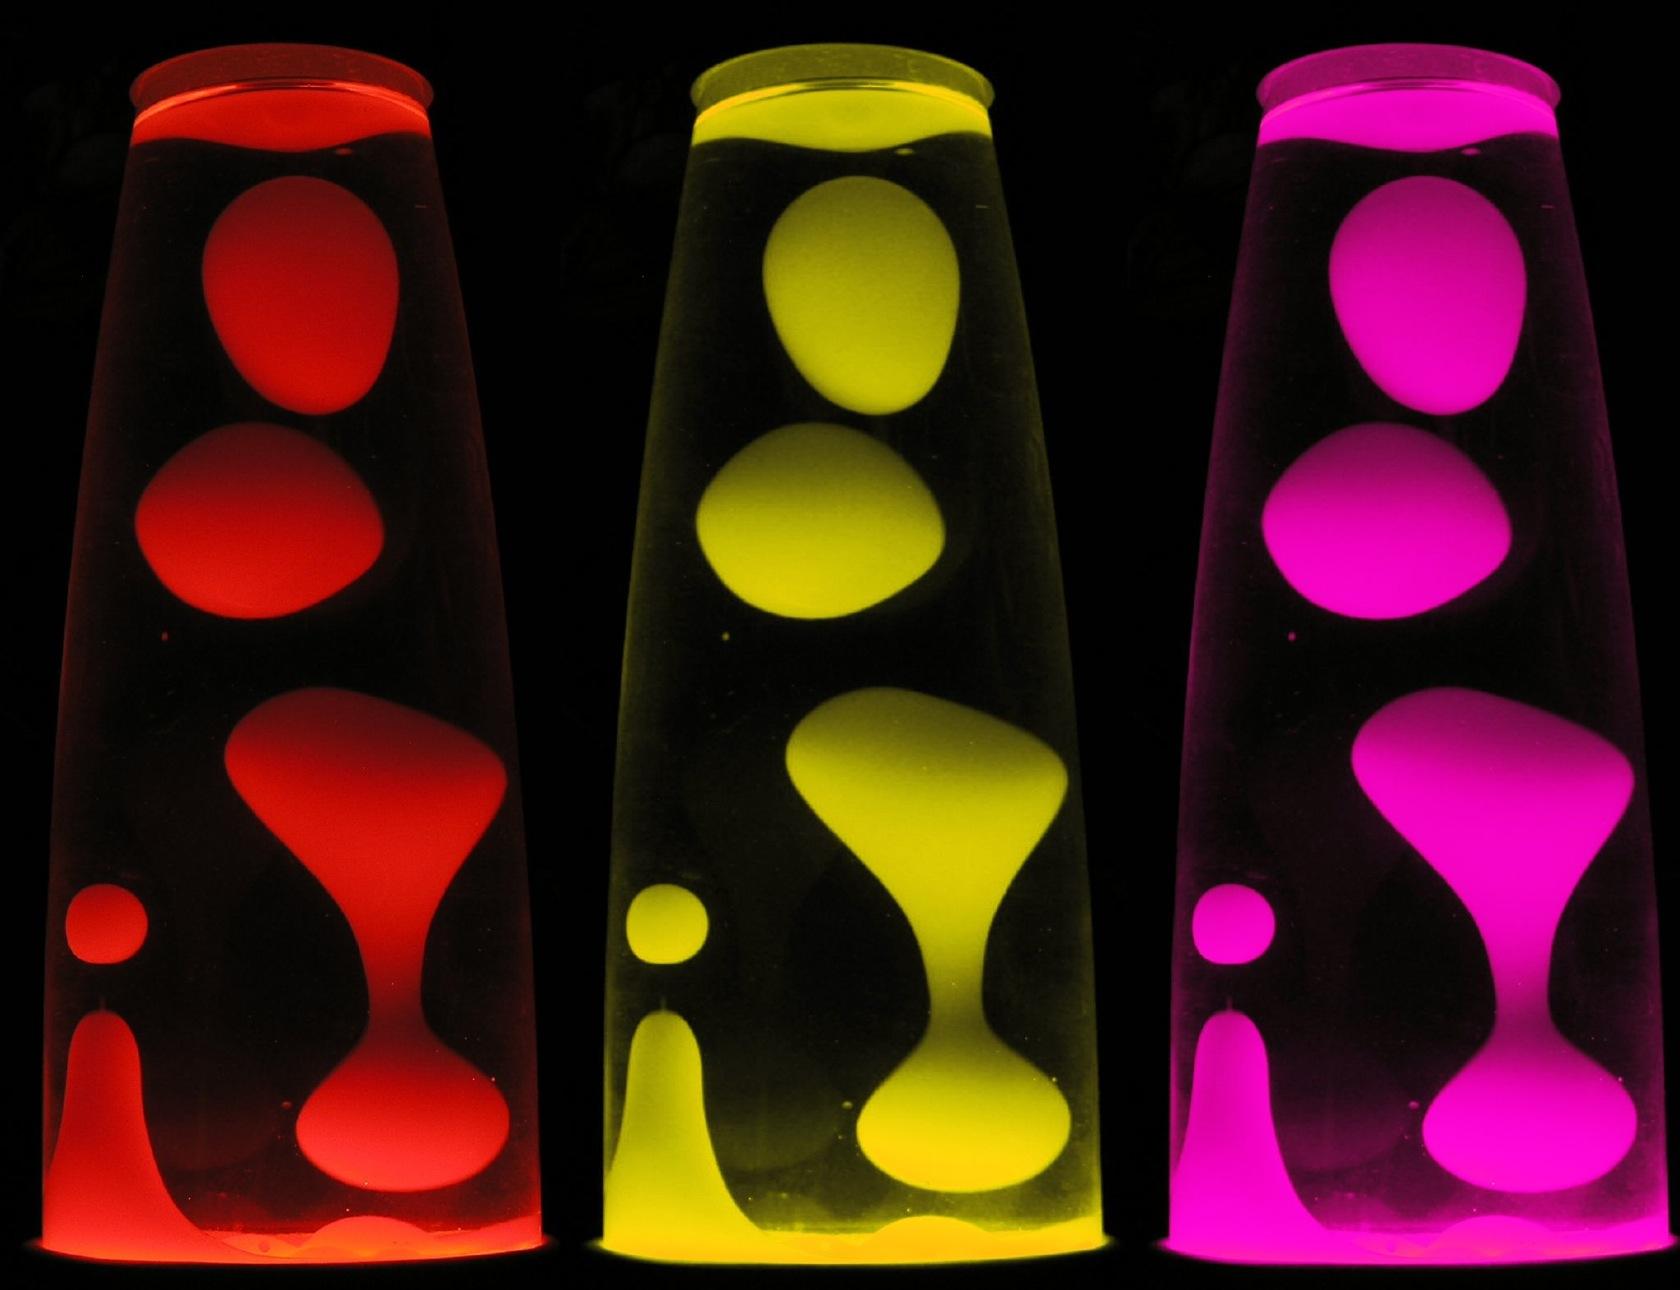 Lava Lamp Vector - Lava lamp